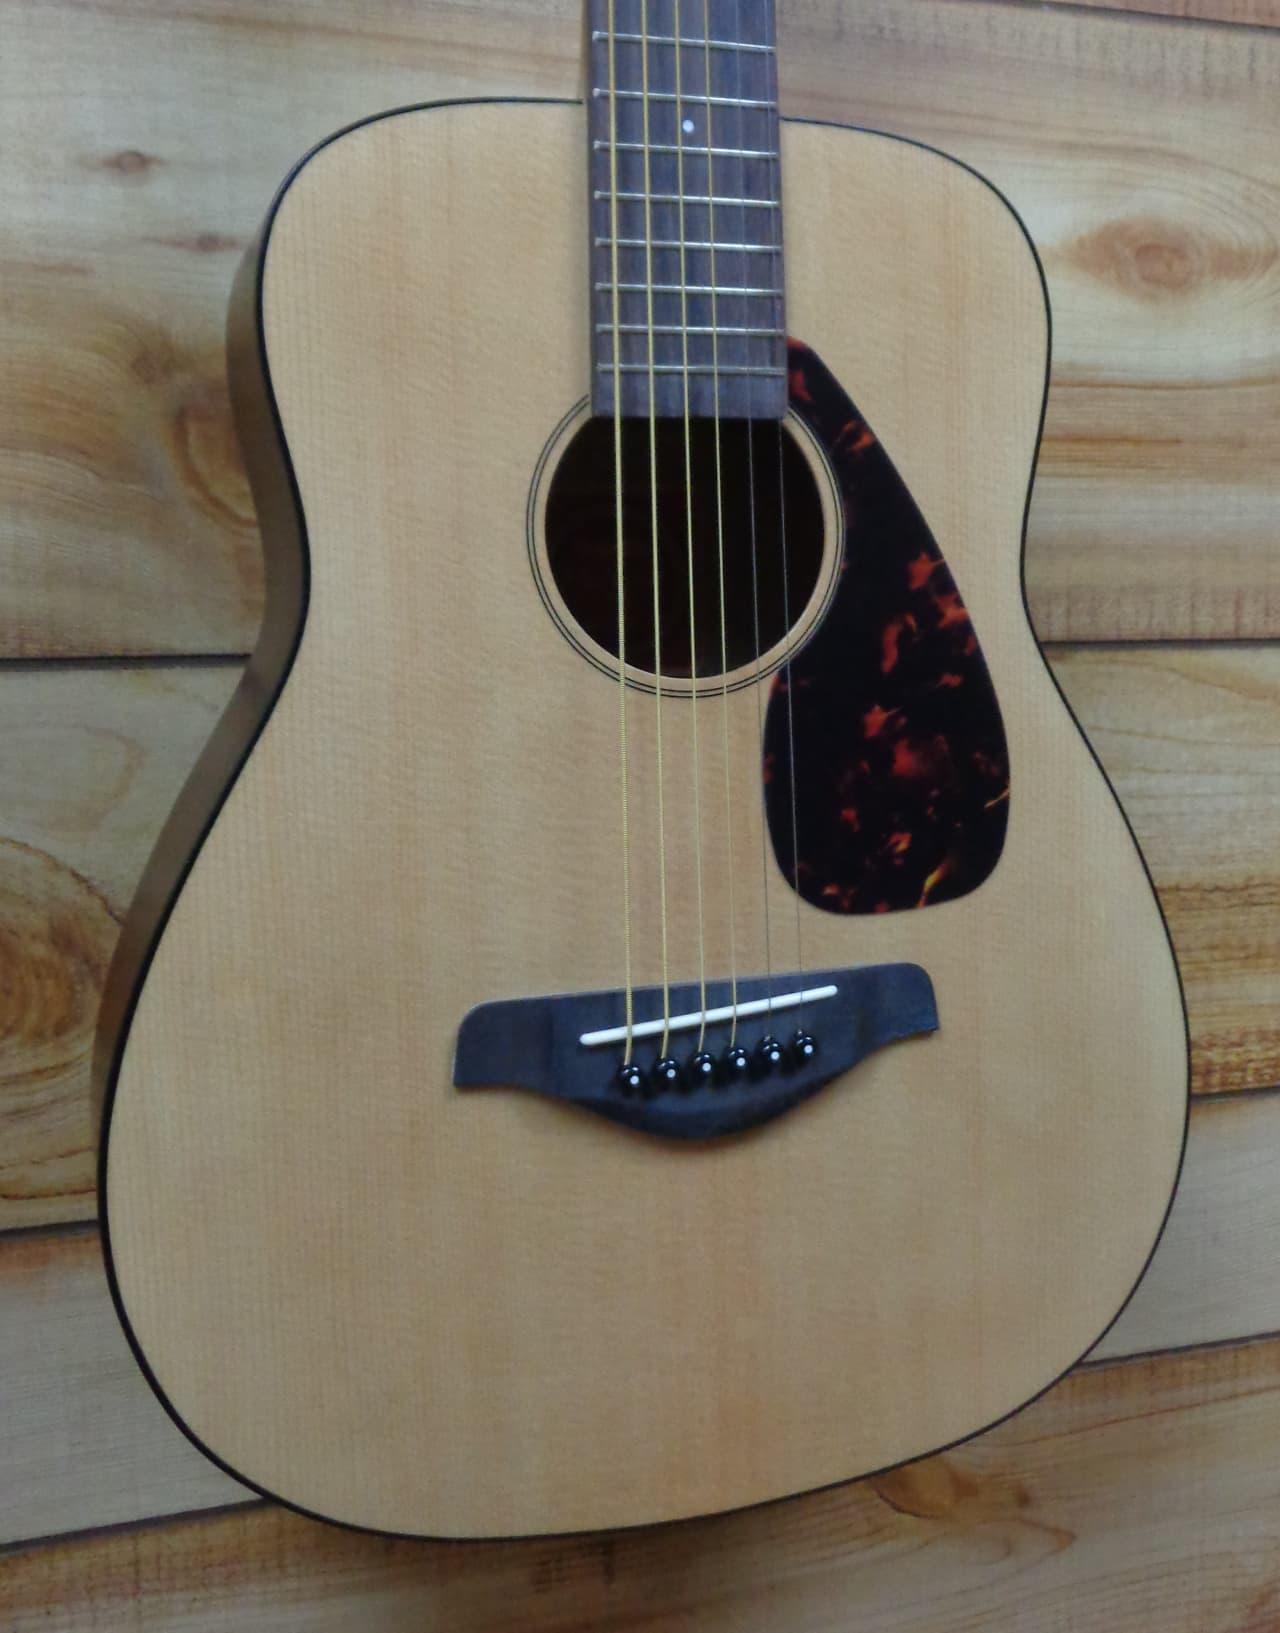 New yamaha jr2 3 4 size acoustic guitar natural w gigbag for Yamaha jr2 3 4